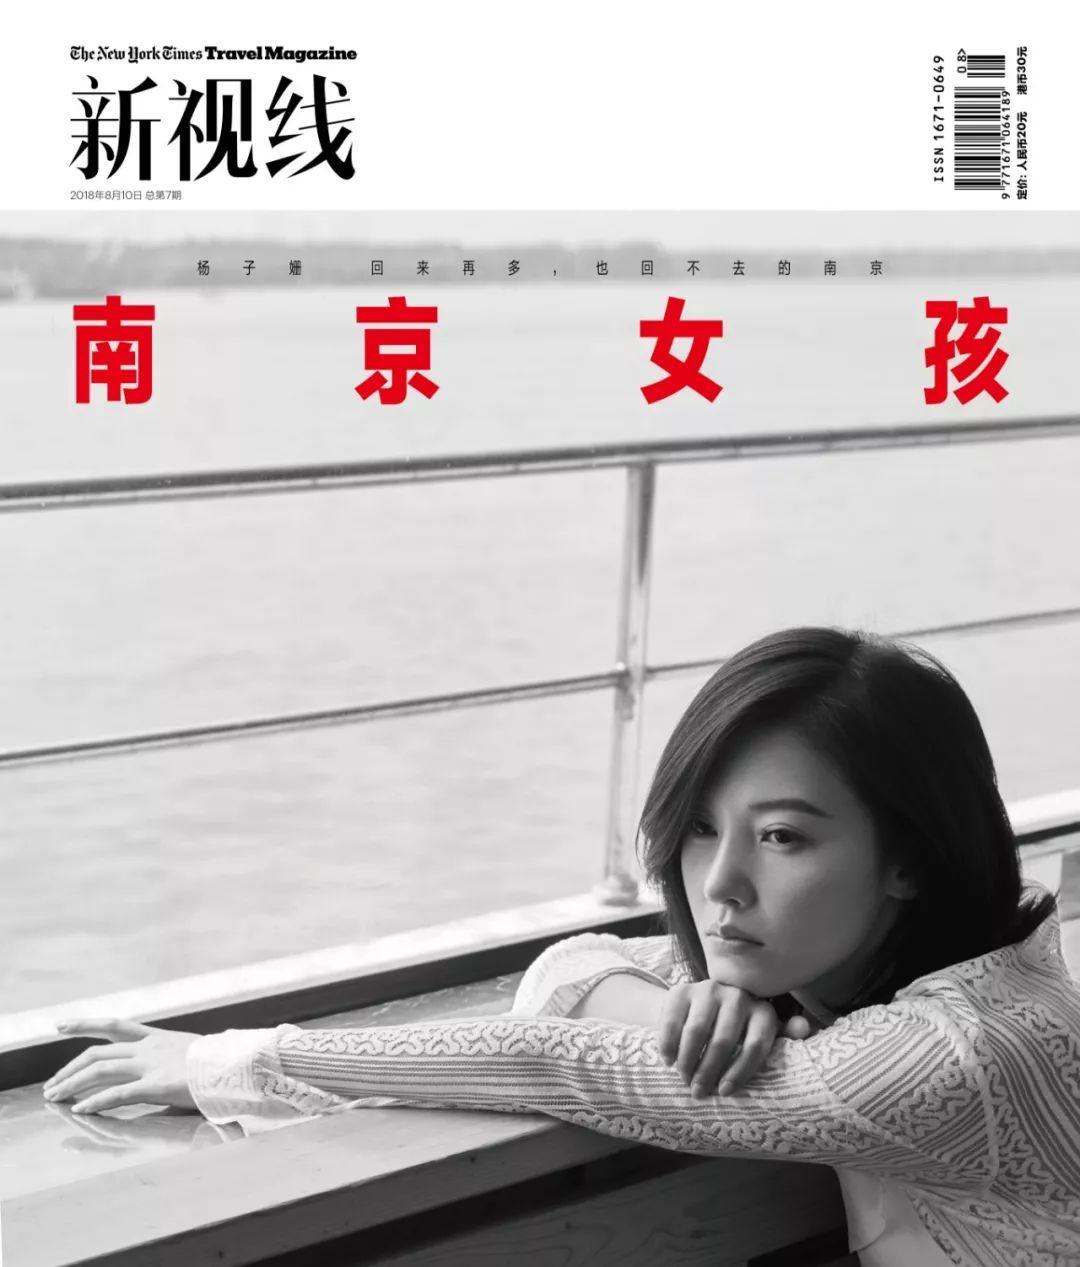 《NY Times Travel新视线》南京女孩-杨子珊